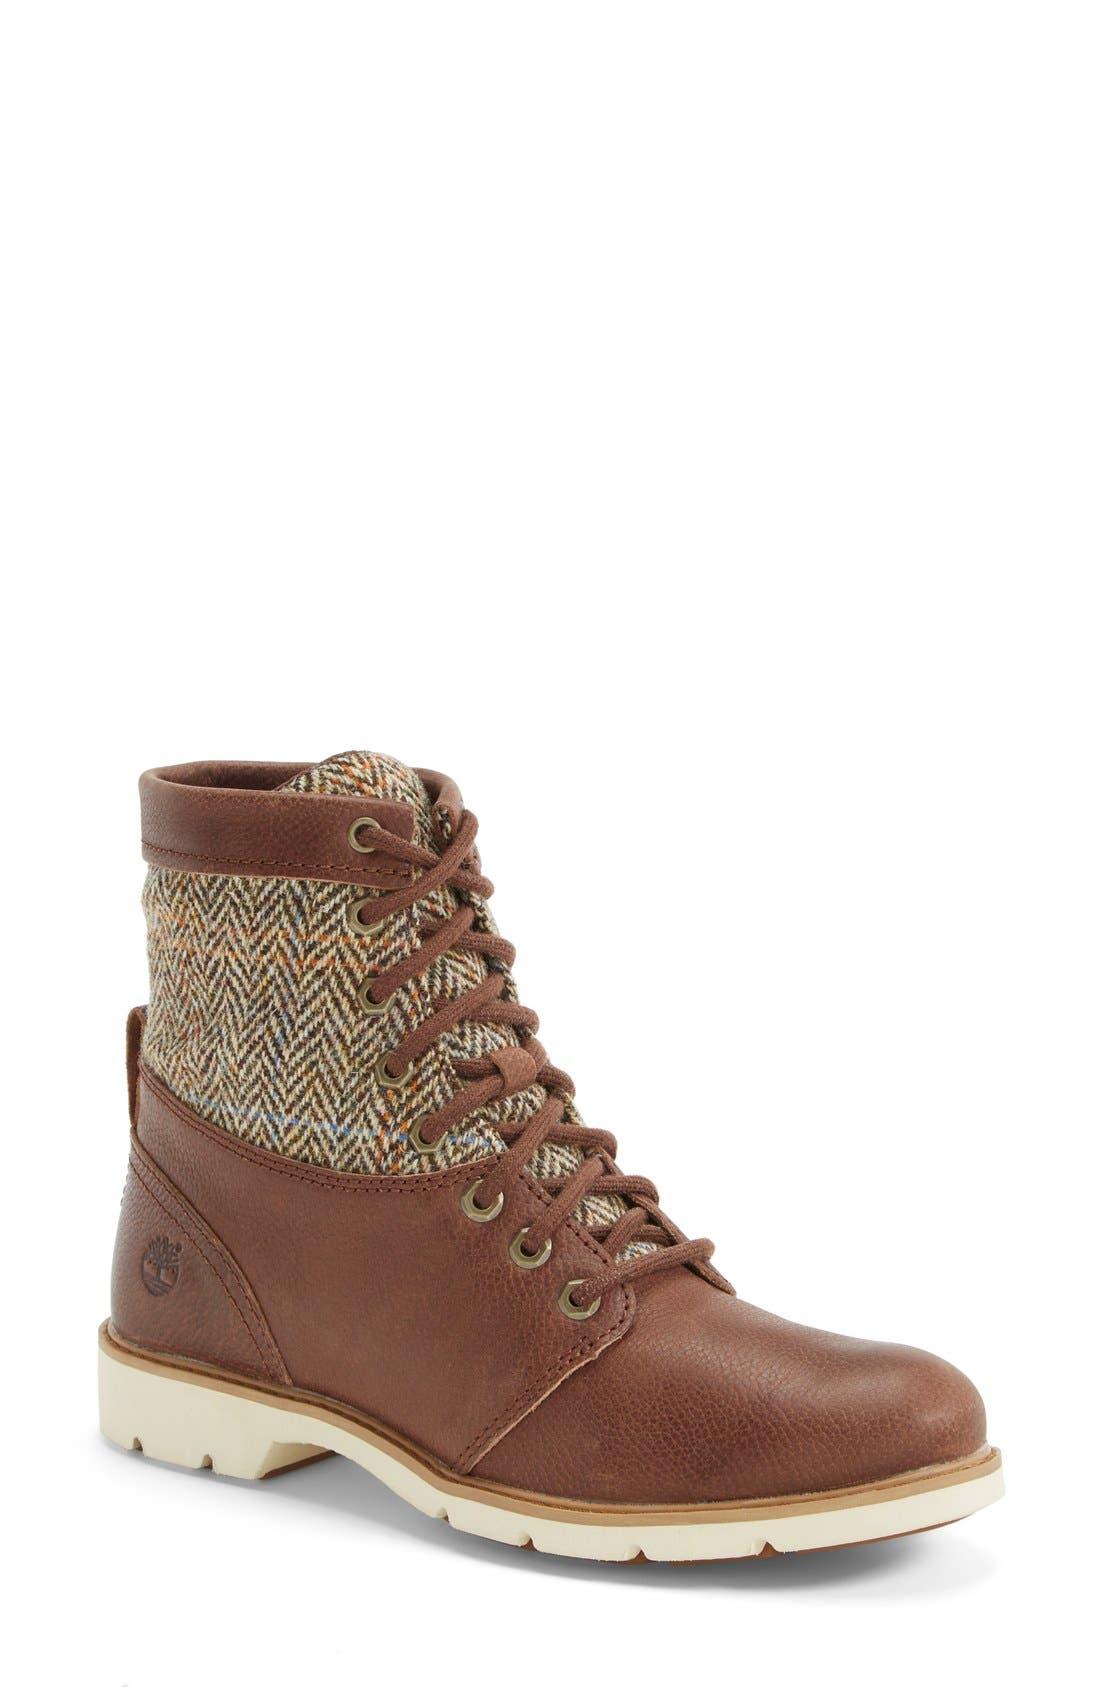 Alternate Image 1 Selected - Timberland 'Bramhall Six Inch' Boot (Women)